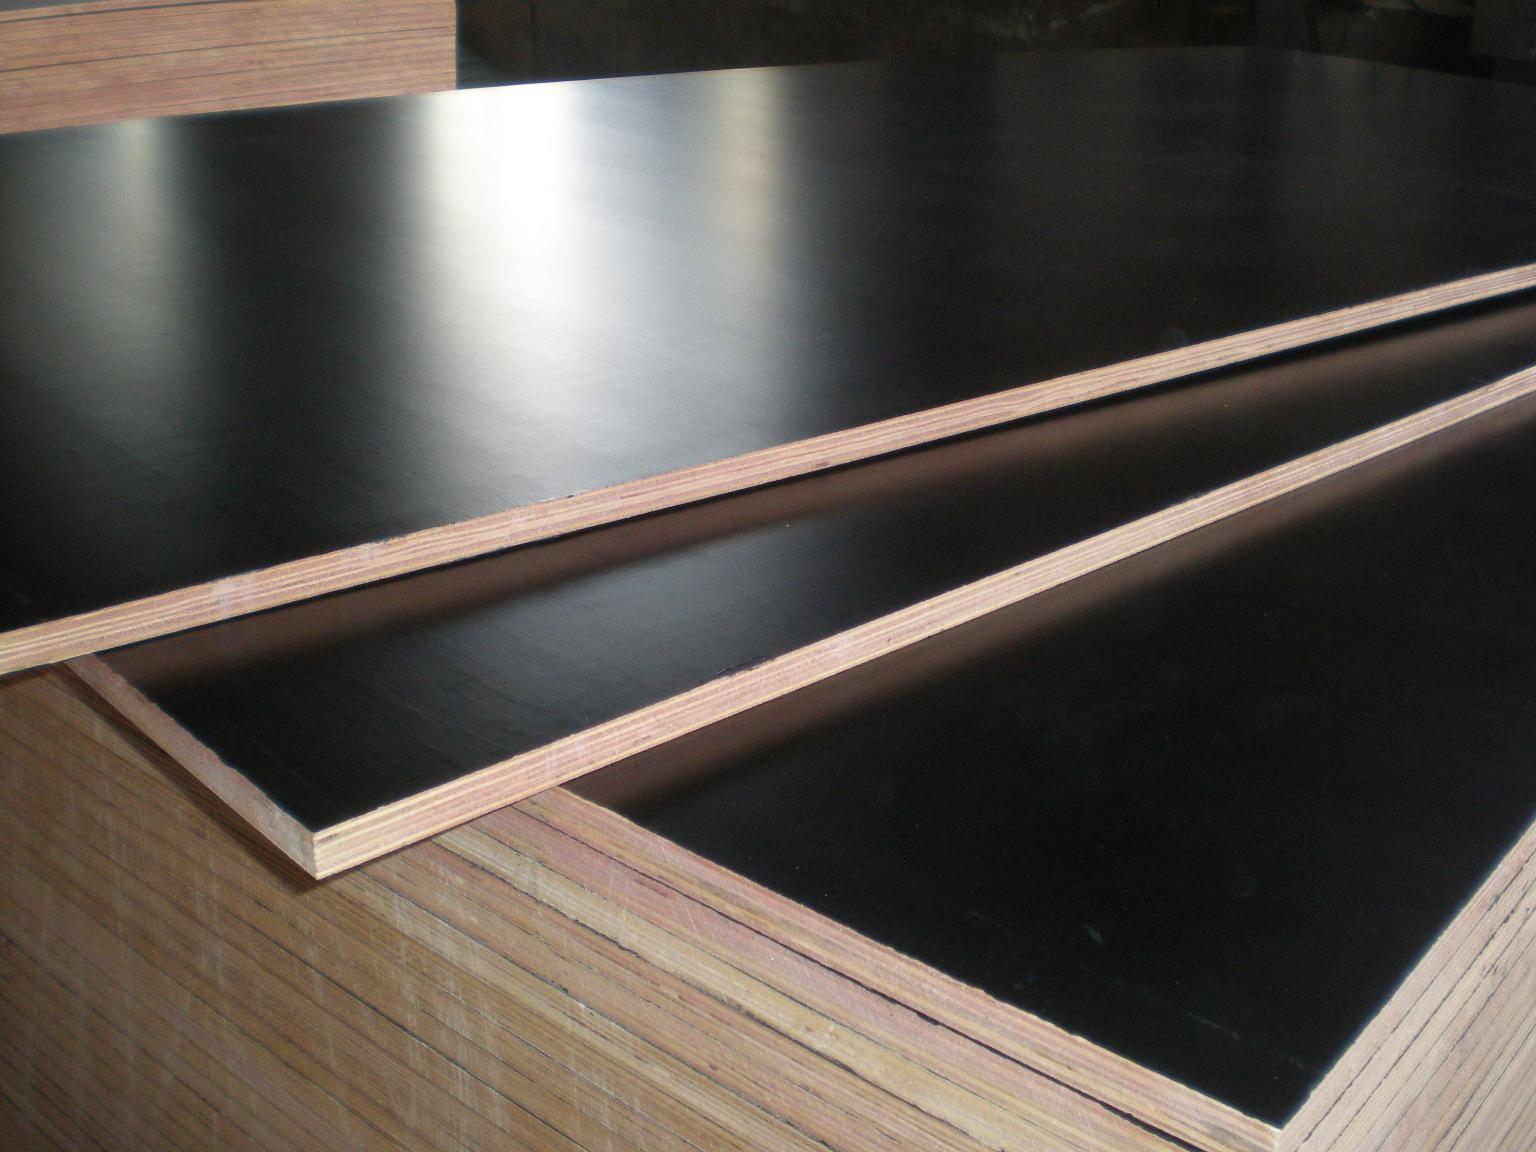 Hot selling Marine Plywood Marine Plywood for wholesales